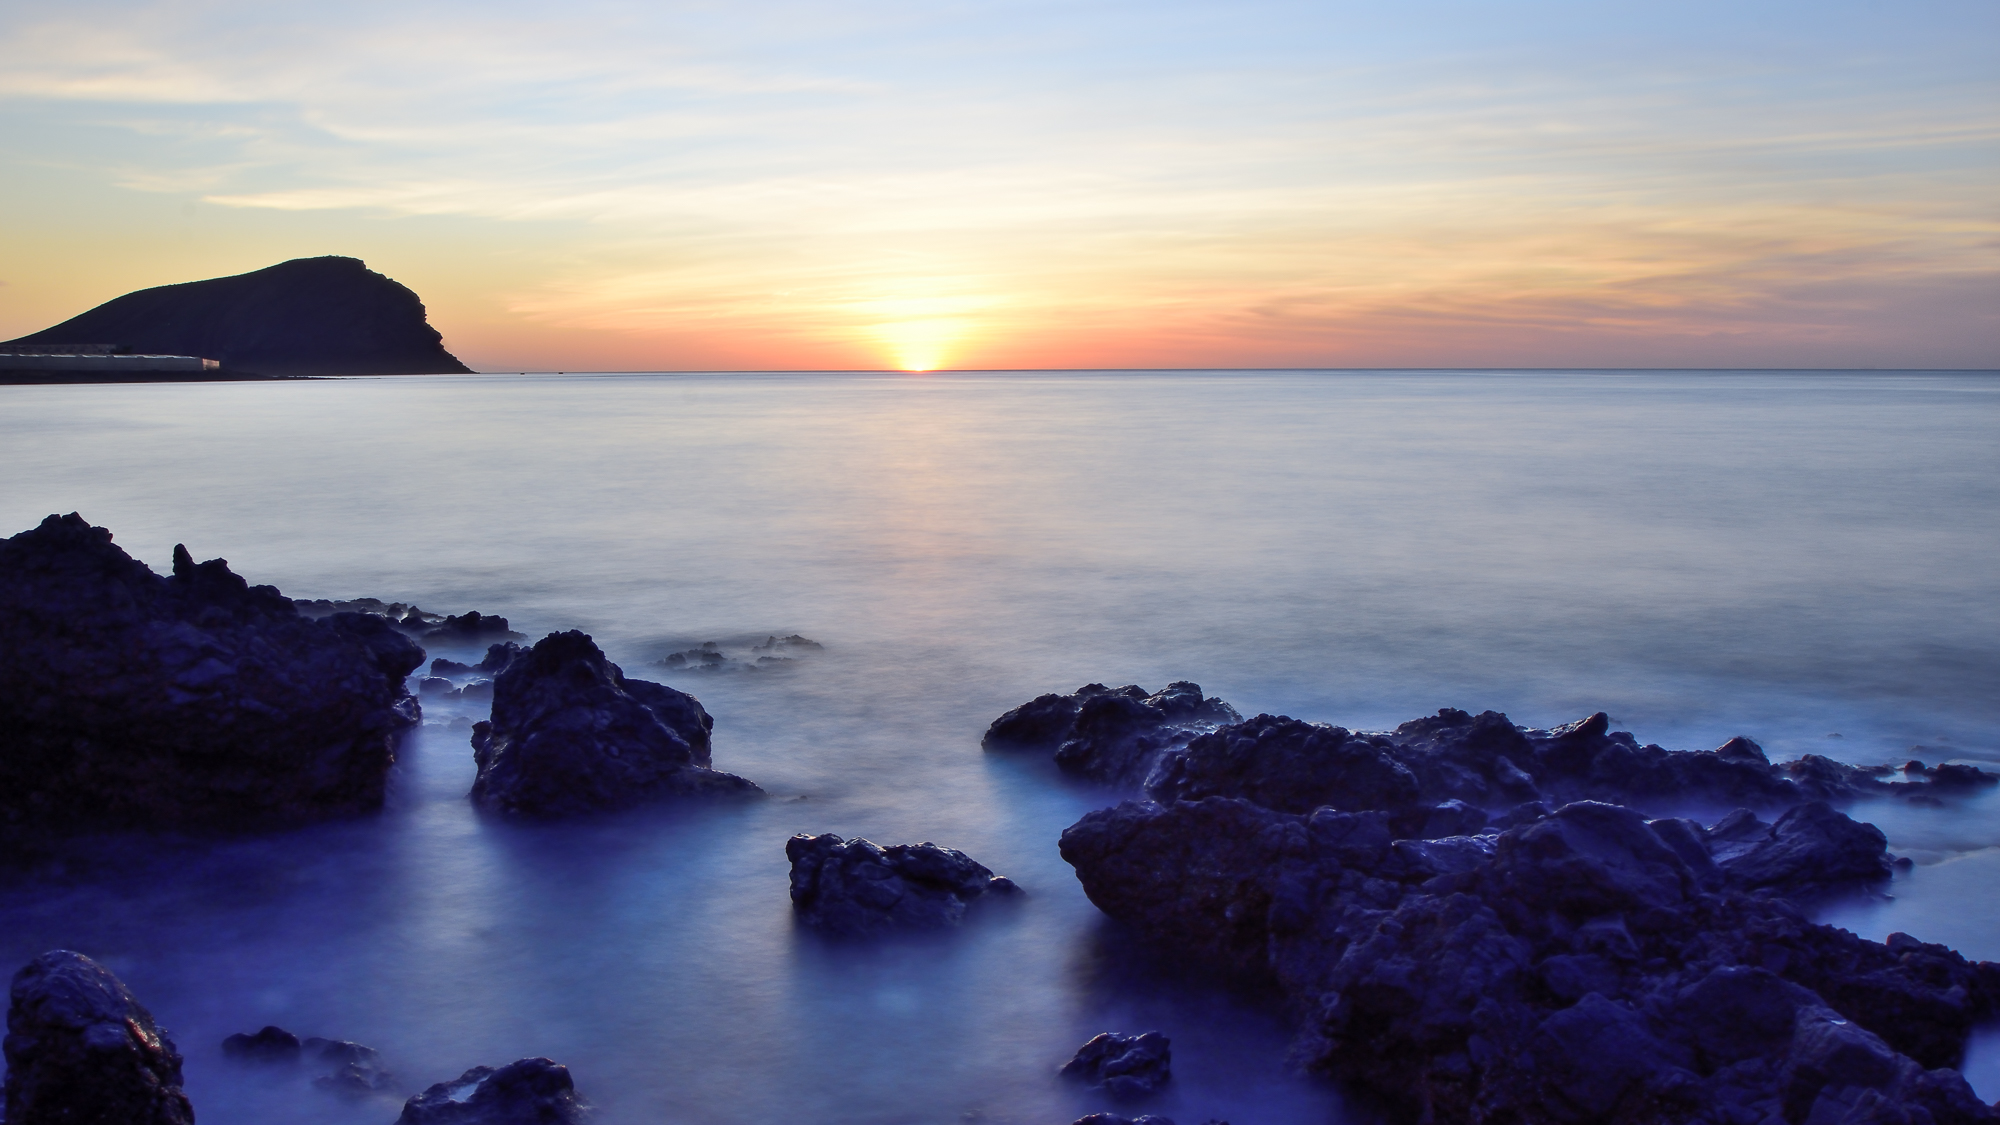 Sunrise Montana Roja, Spain